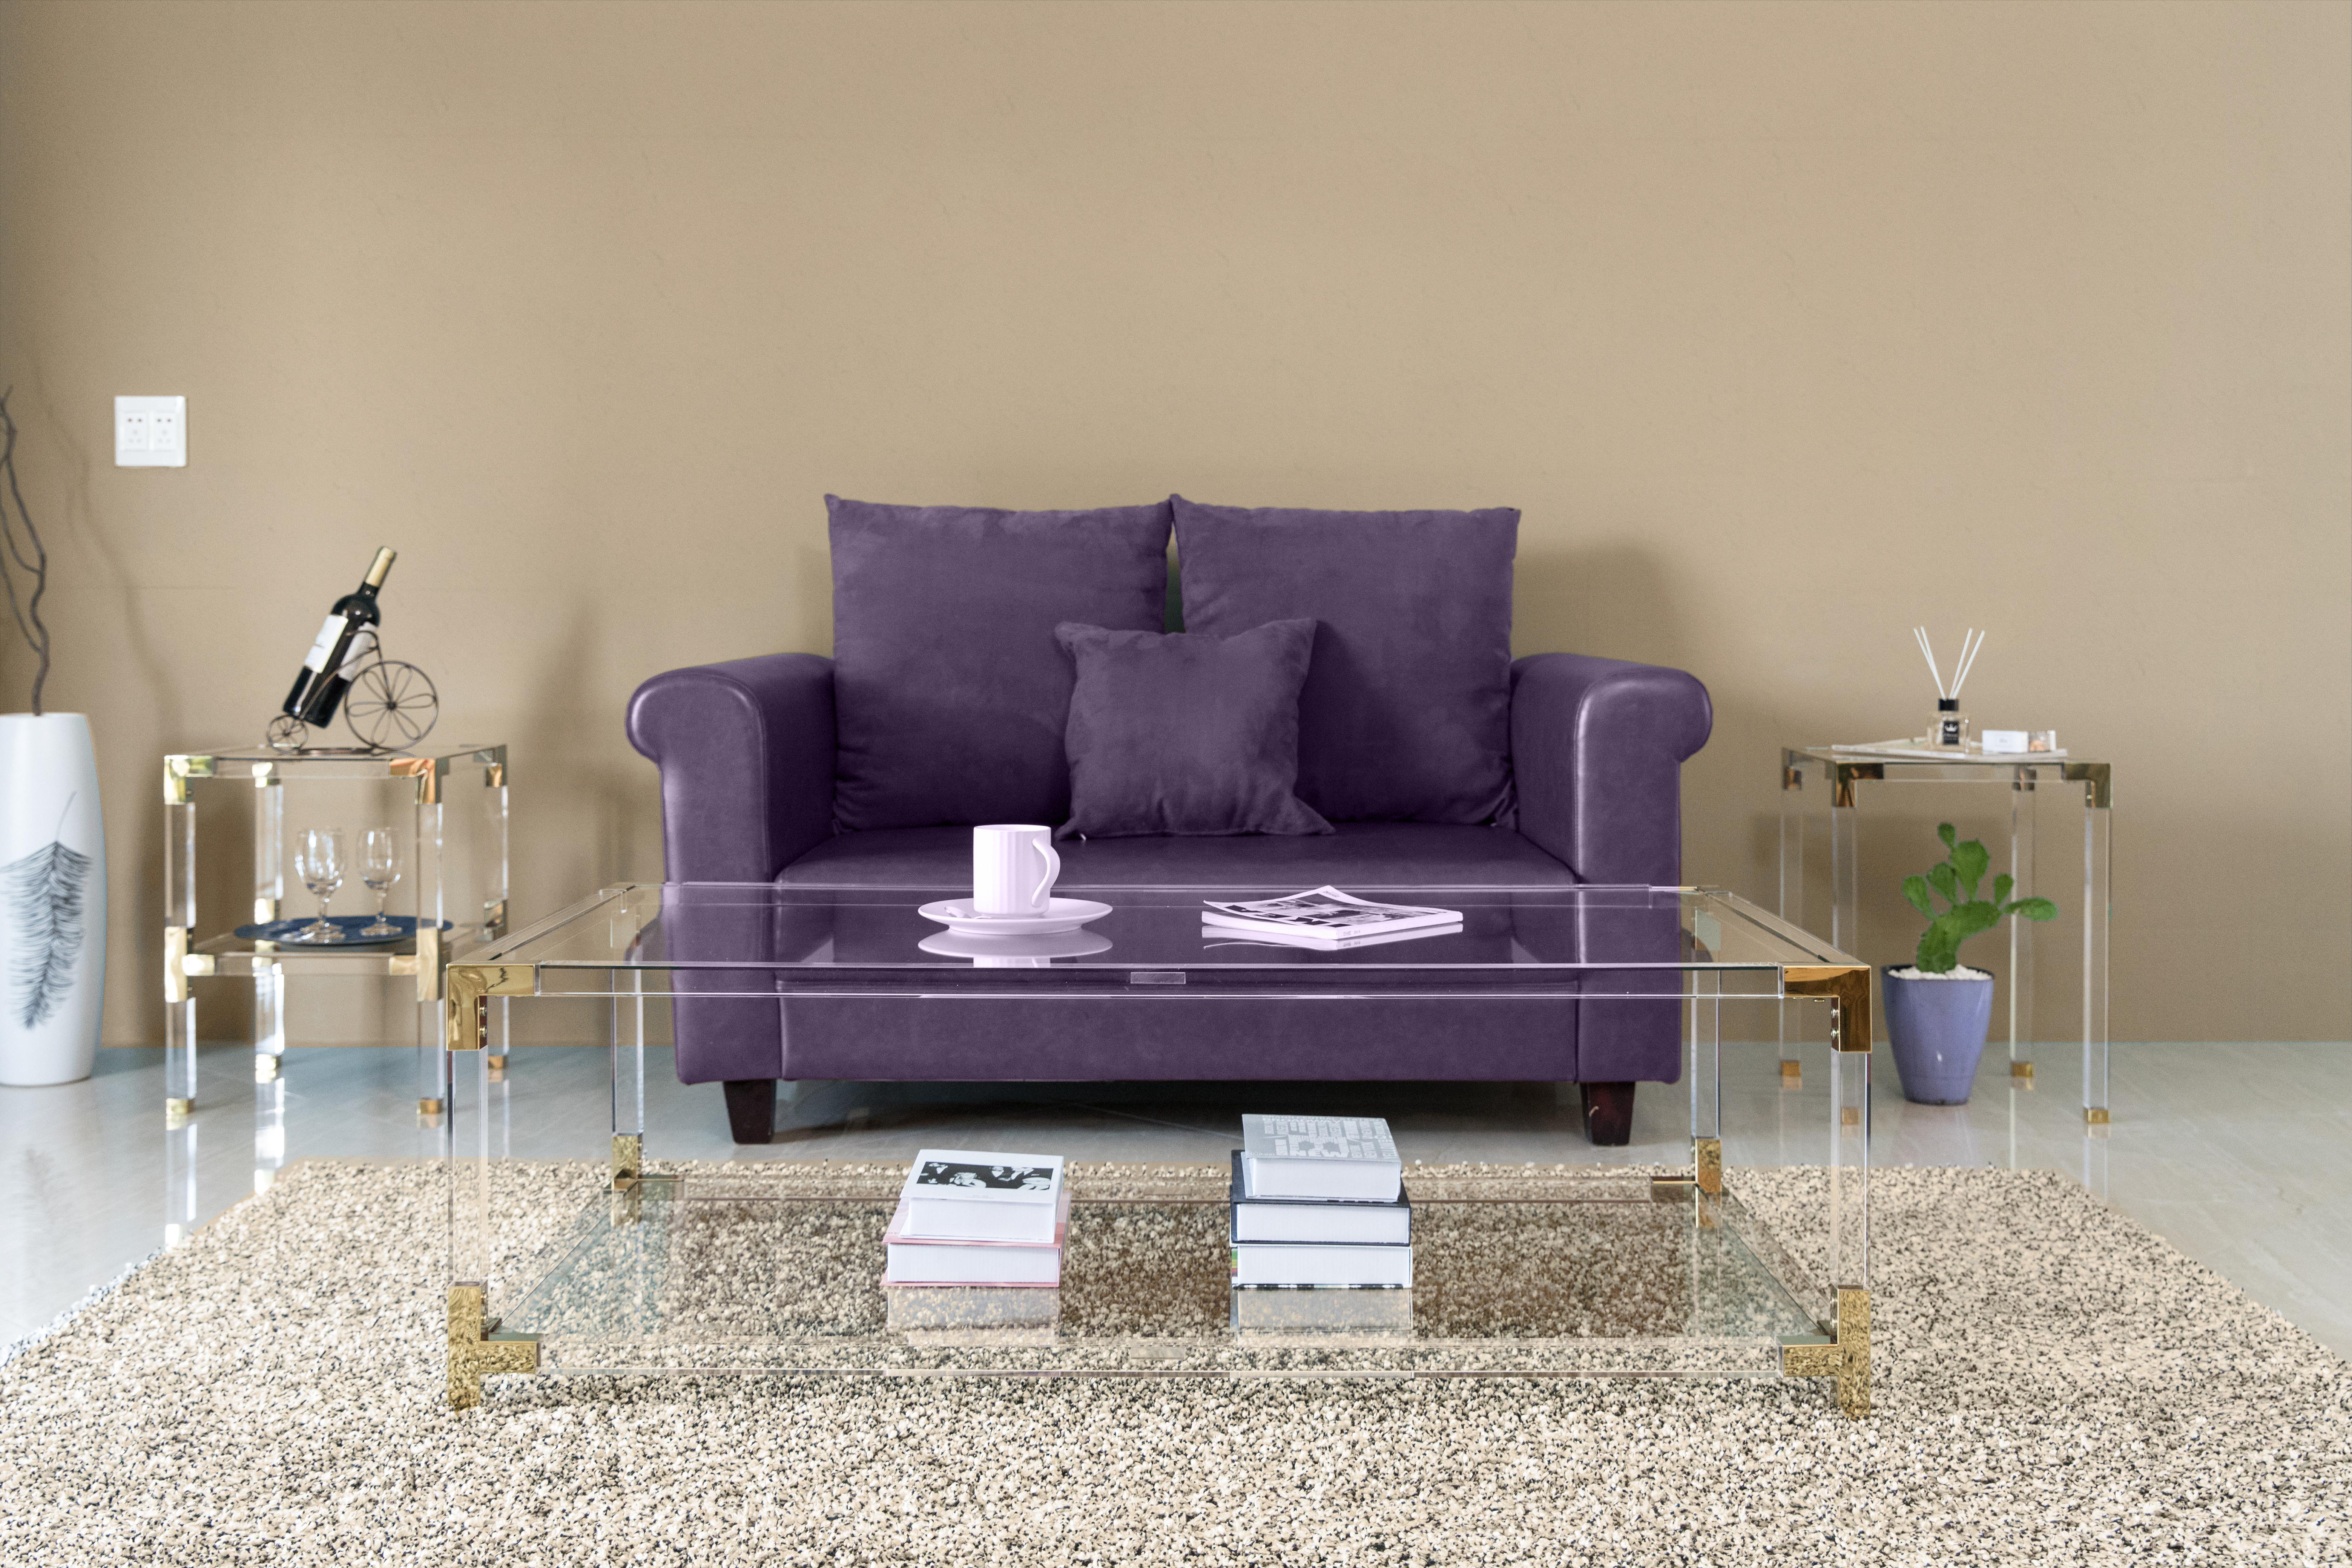 acrylic-living-room2.jpg